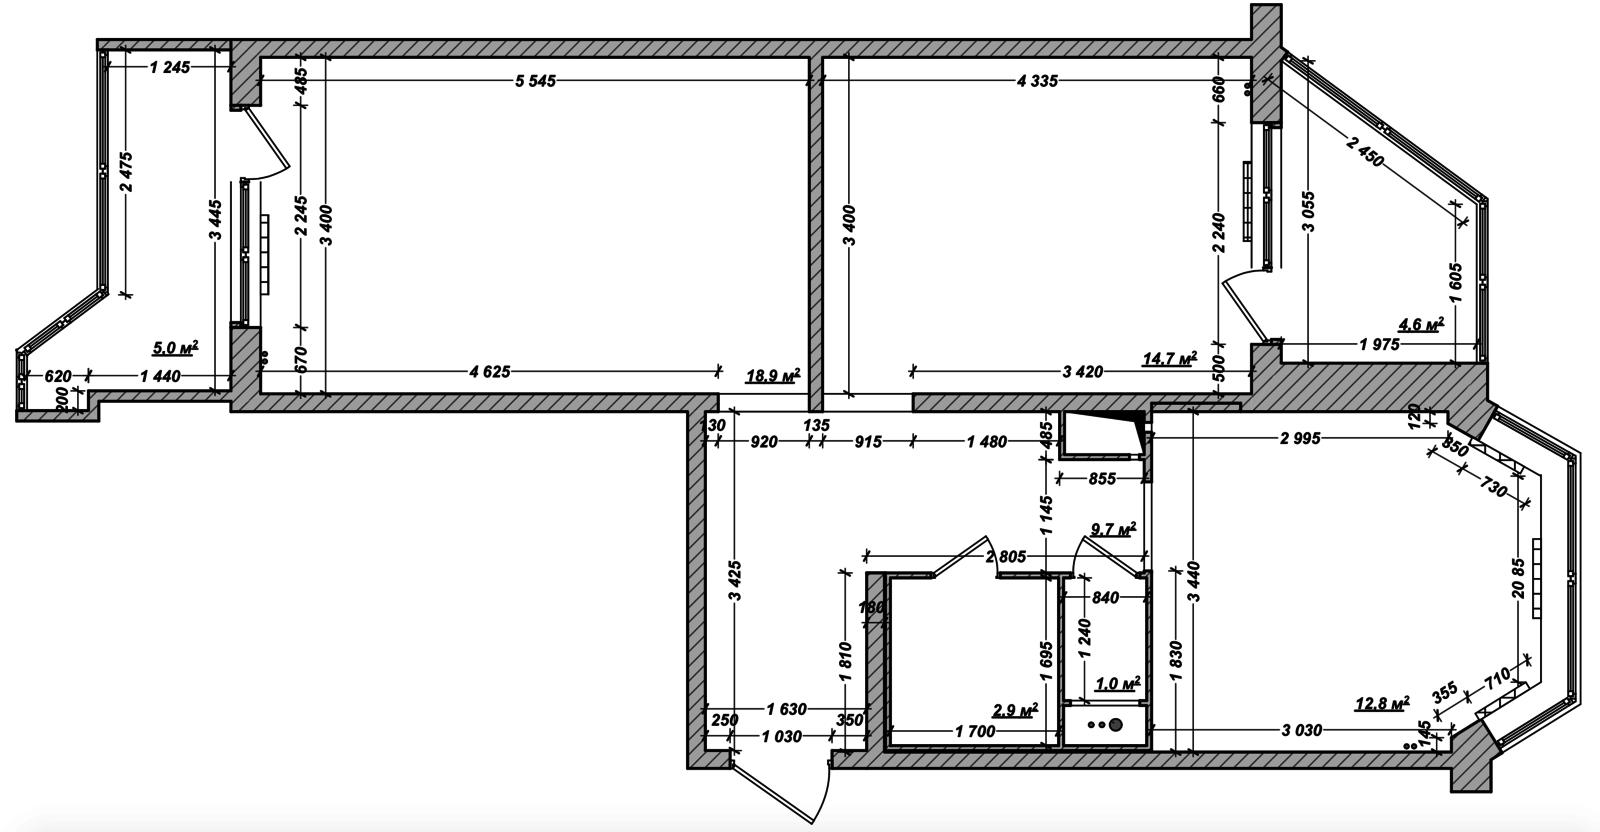 Скандинавская квартира в доме серии п-44т / surfingbird - пр.